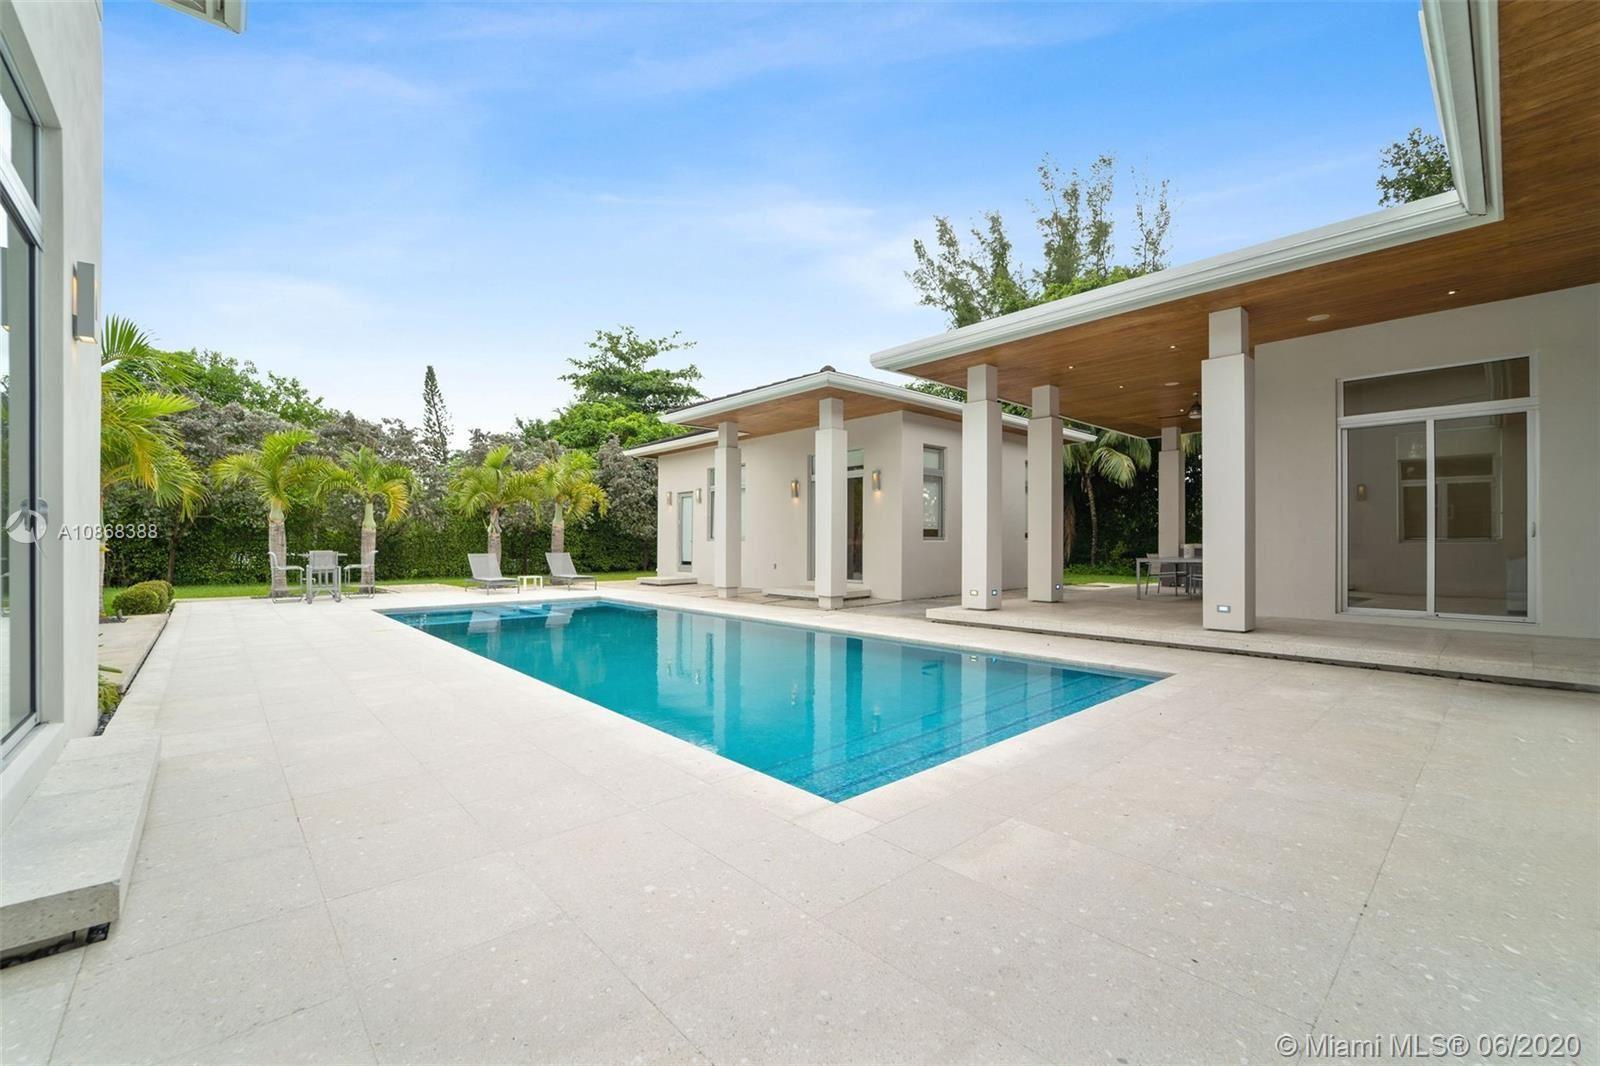 5655 SW 81st Terrace, Miami, FL 33143 - #: A10868388